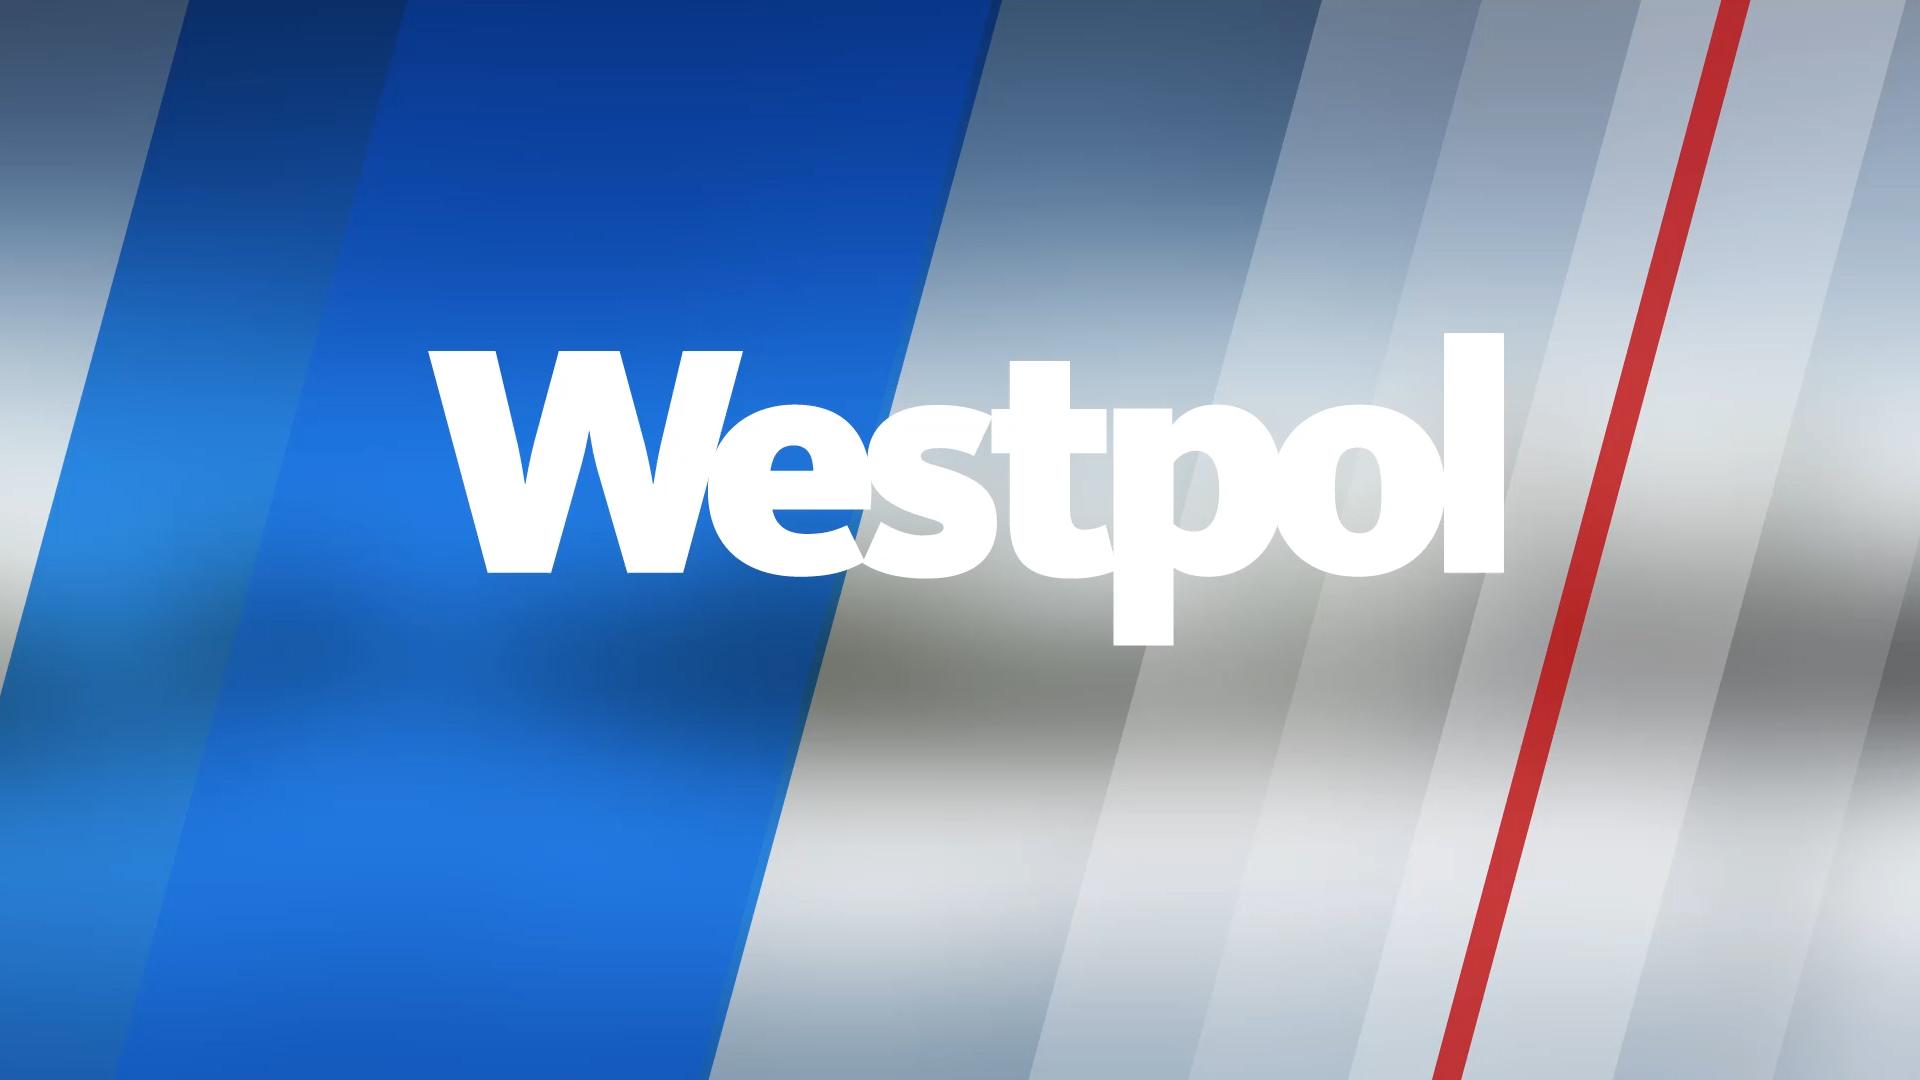 Wdr Westpol Mediathek